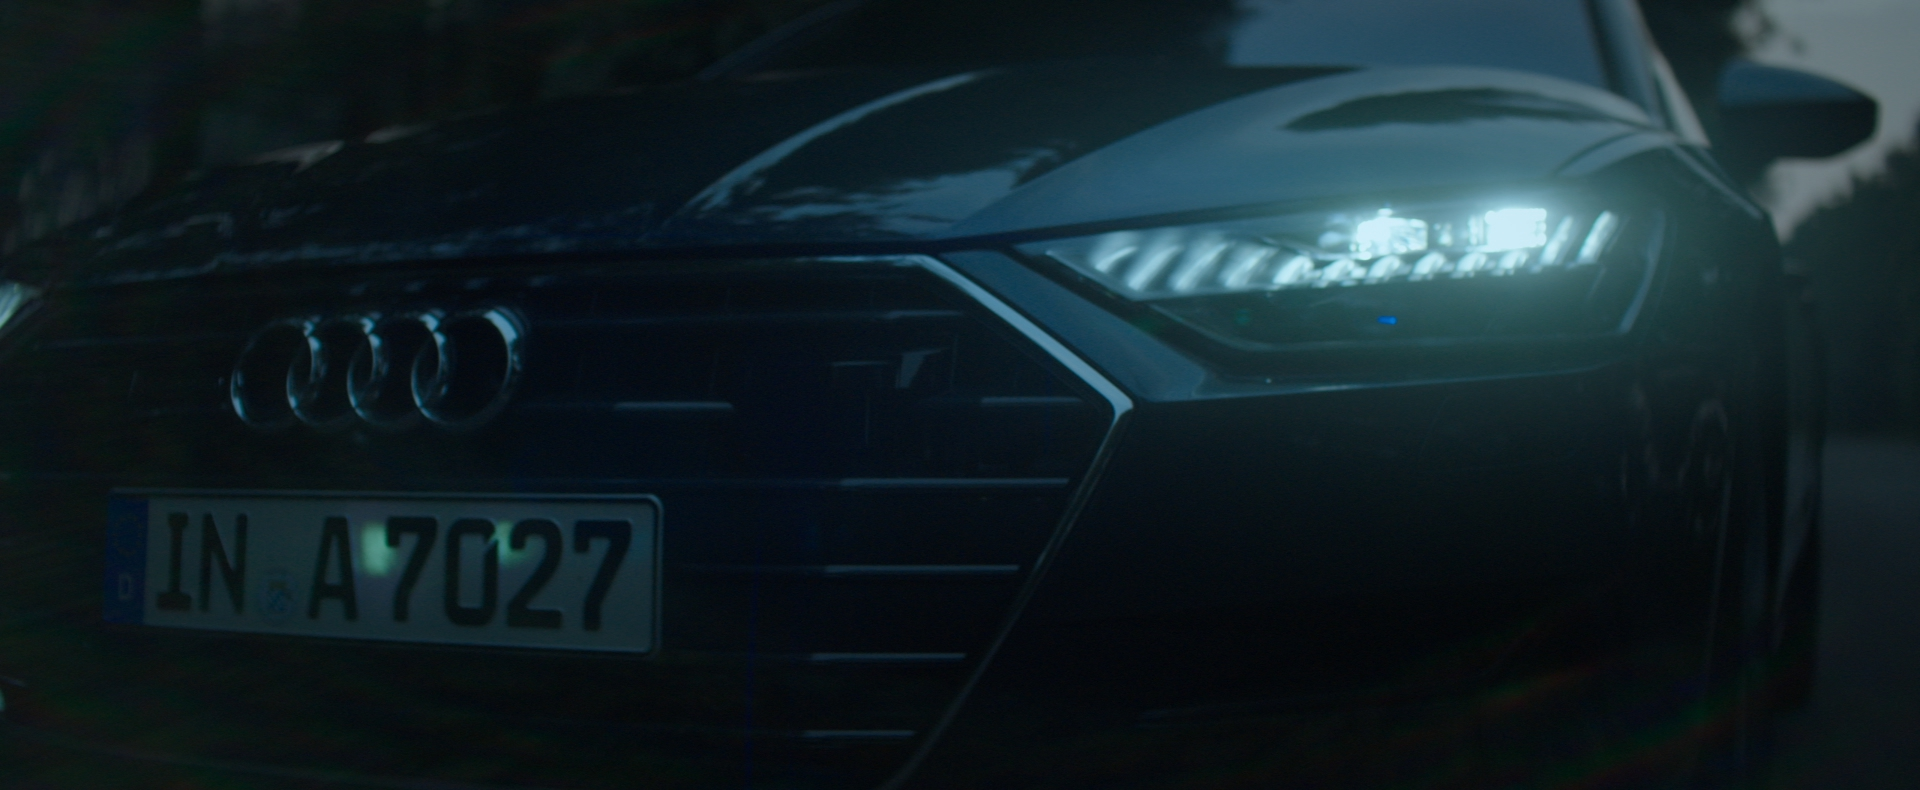 Audi A7_1.1.20.jpg